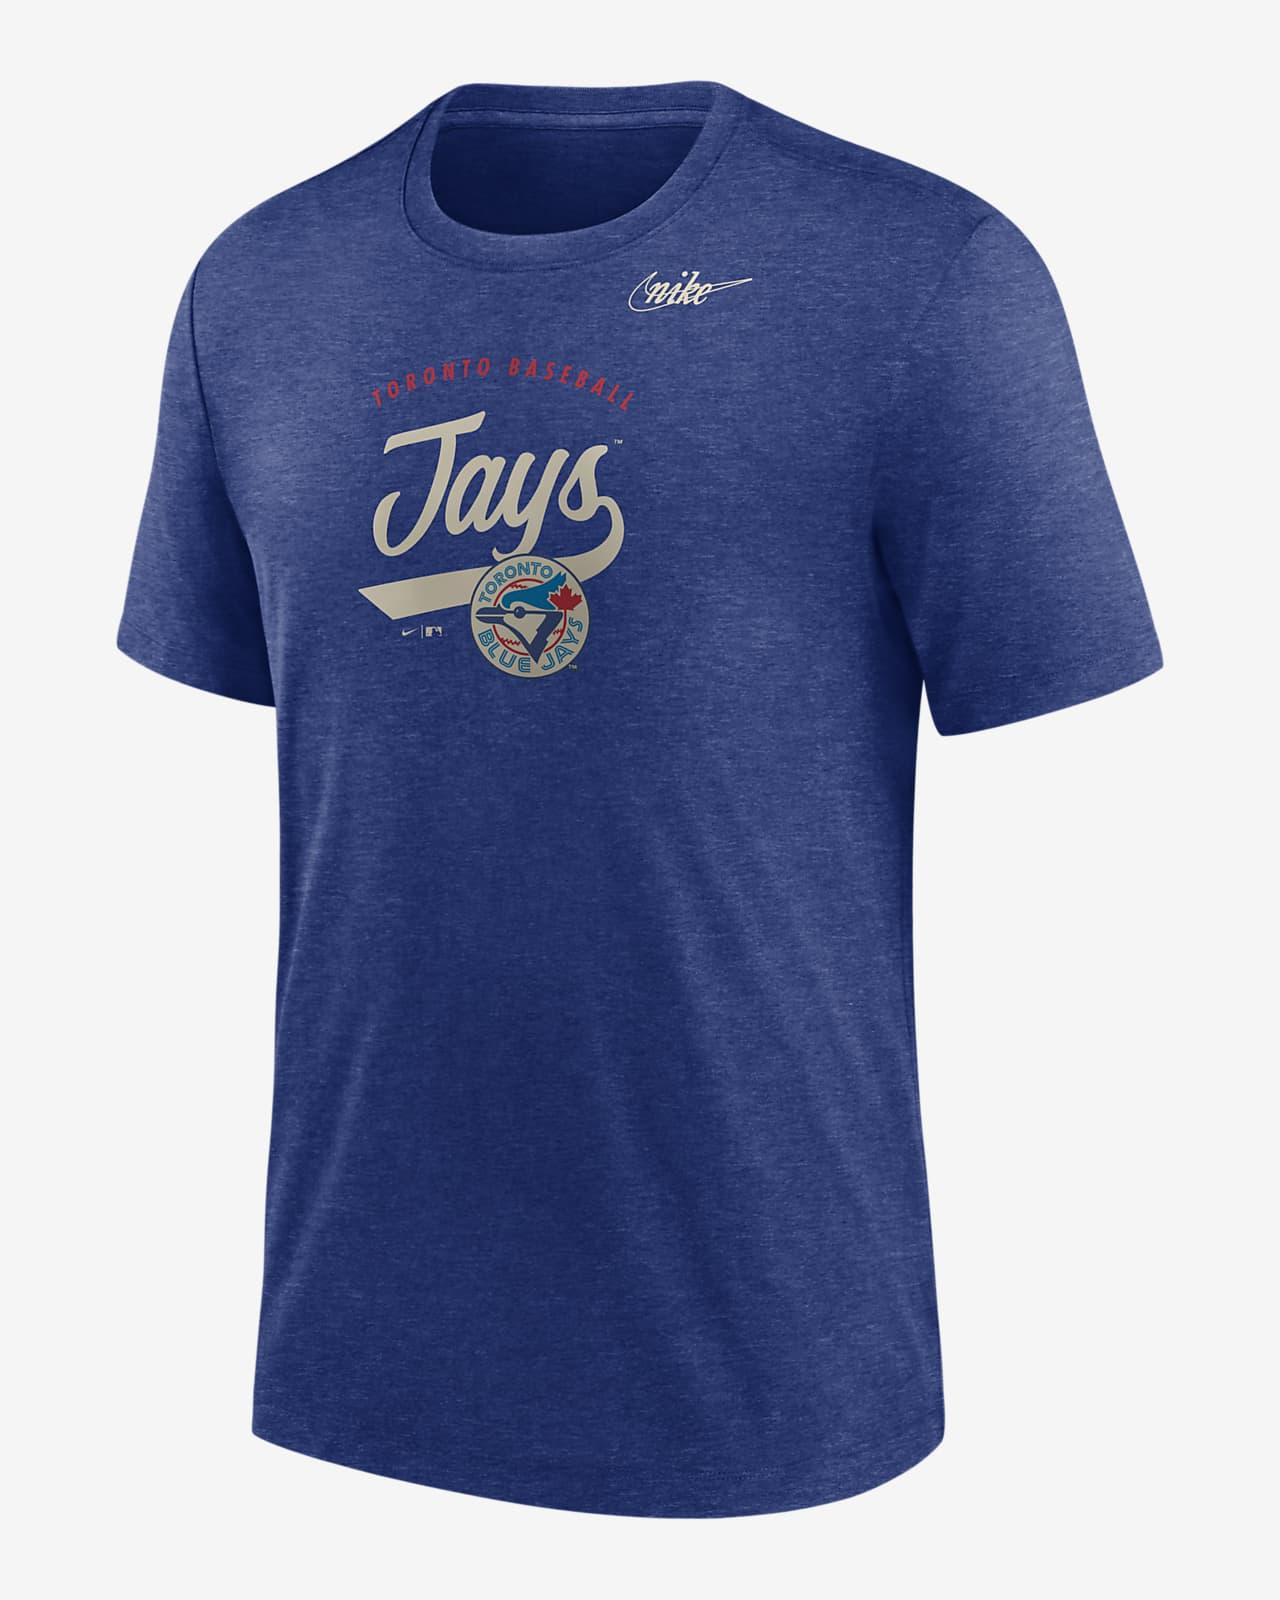 Nike Cooperstown Nickname (MLB Toronto Blue Jays) Men's T-Shirt